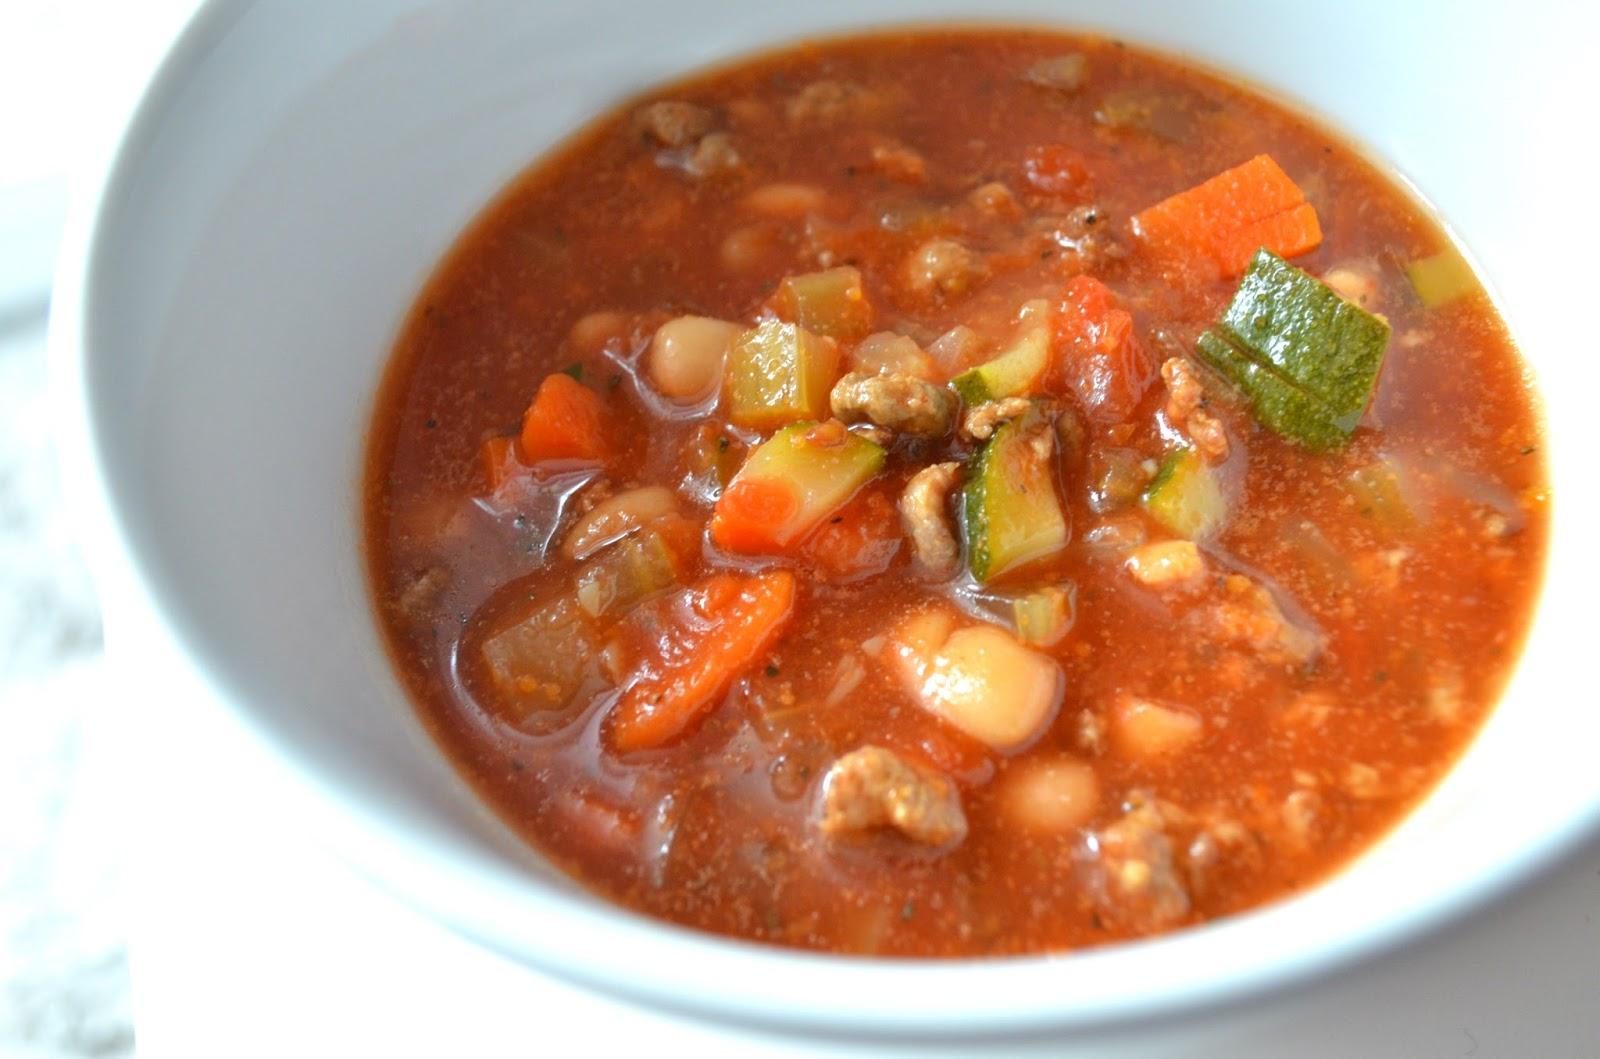 Squishy Zucchini : Stuff & Nonsense: slow cooker